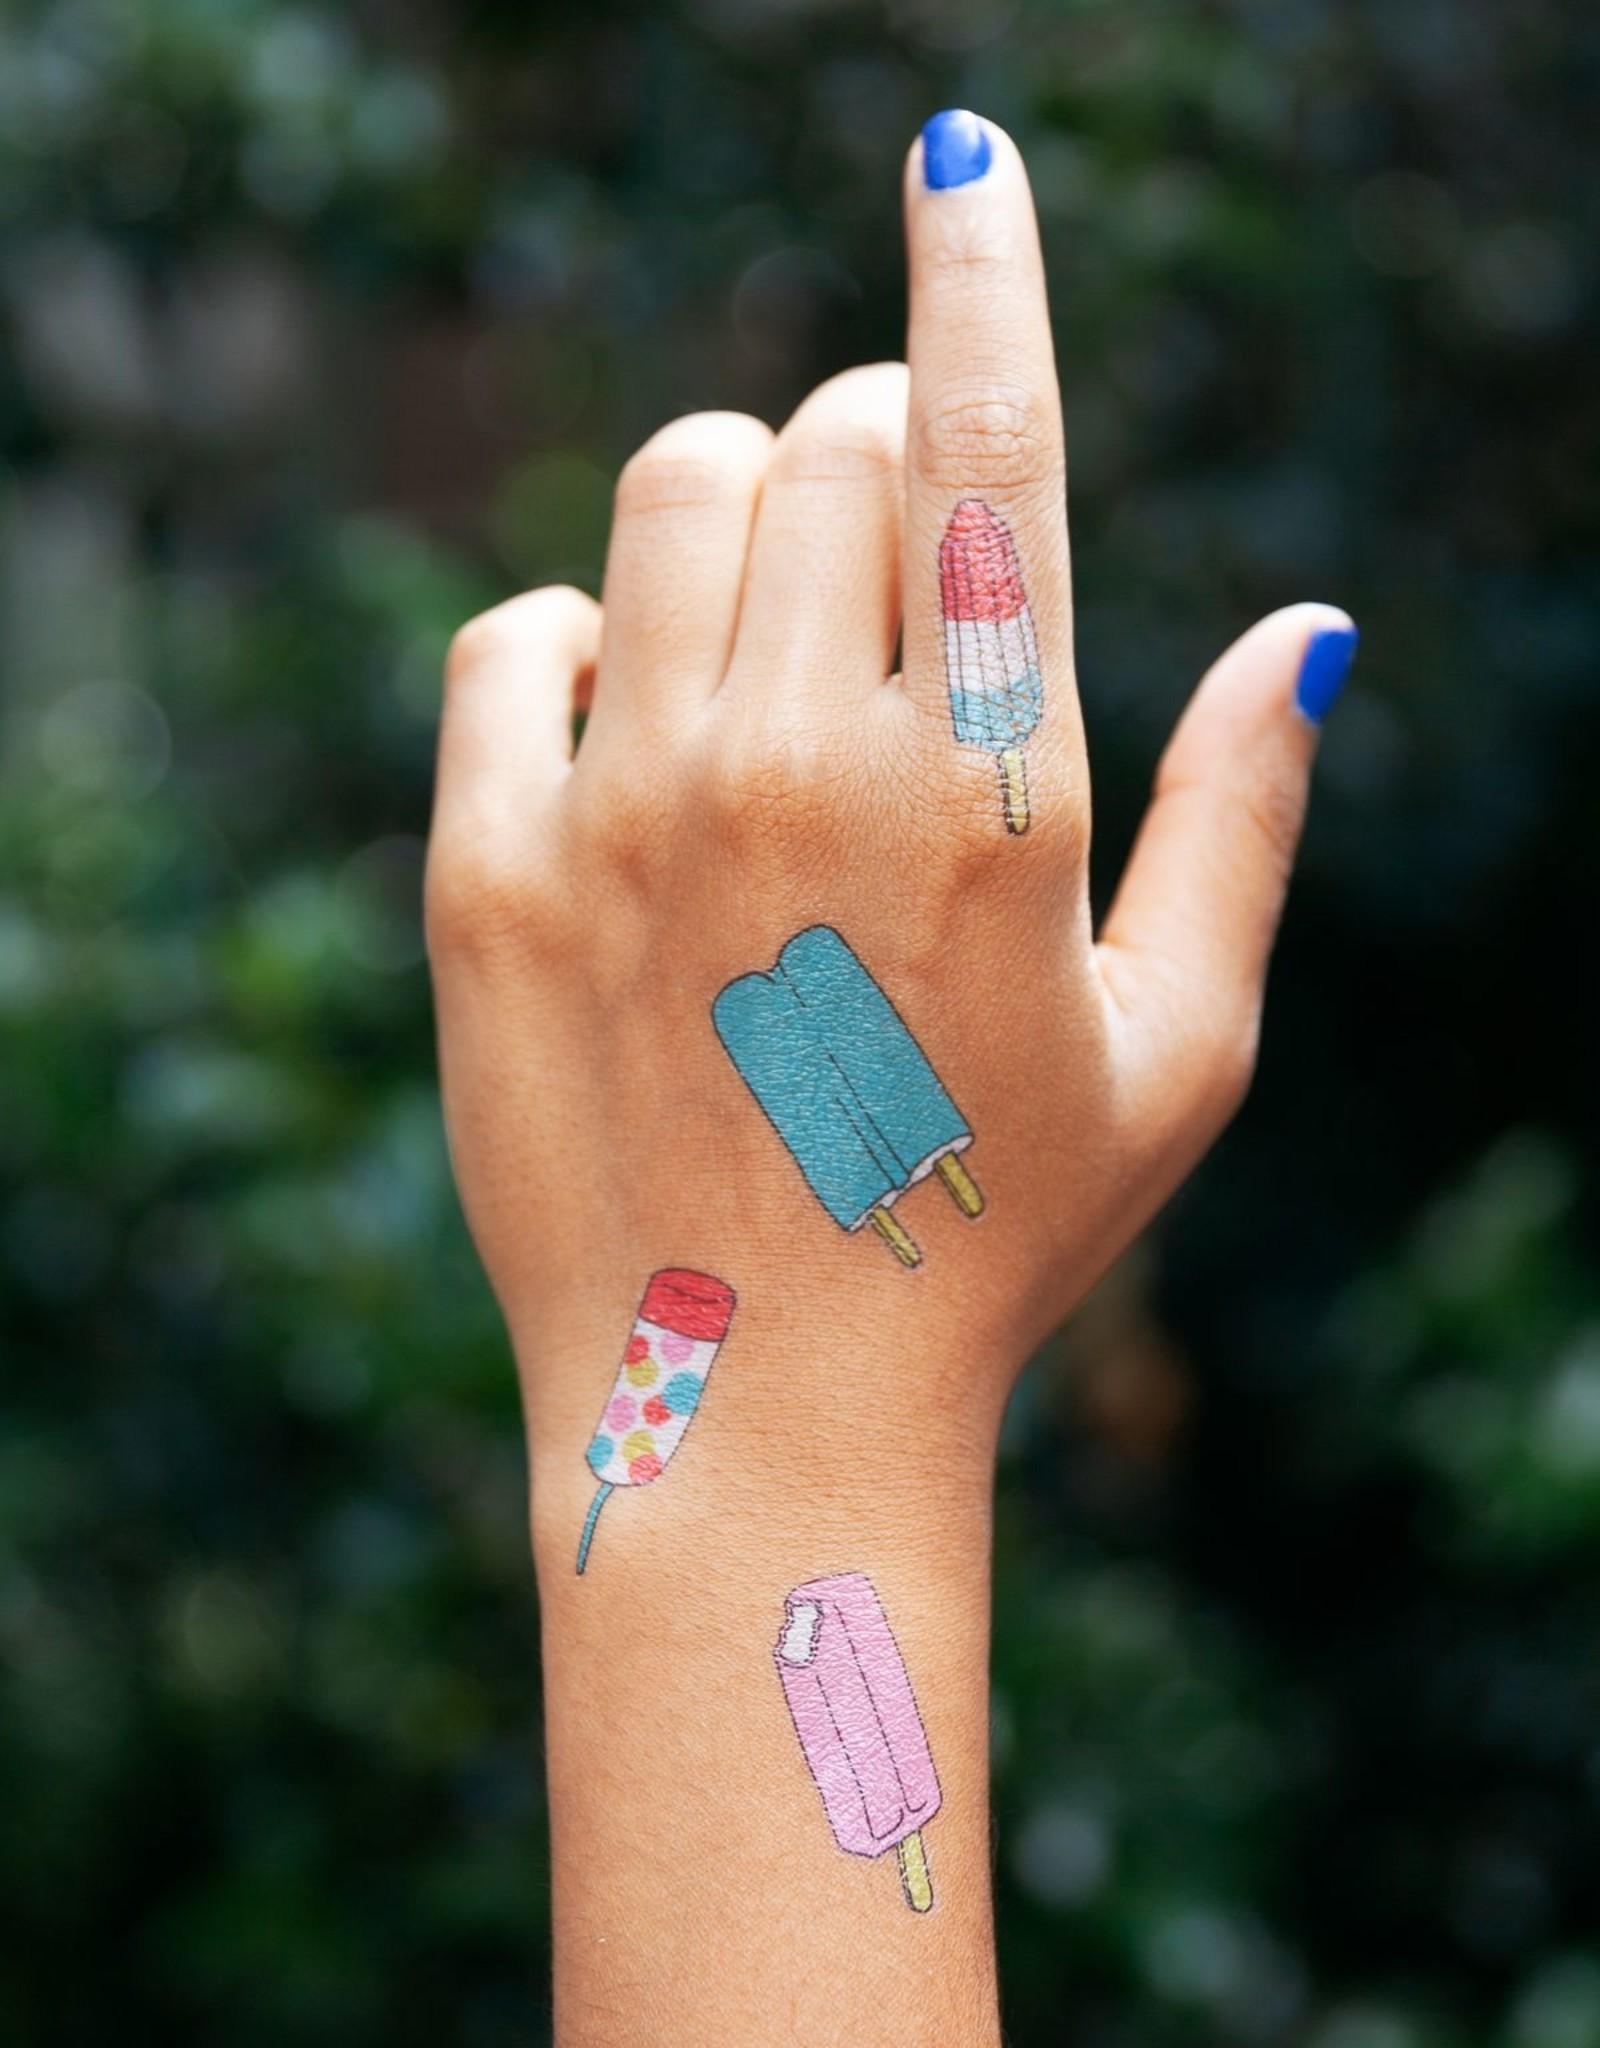 Tattly tattoo pair- popsicles